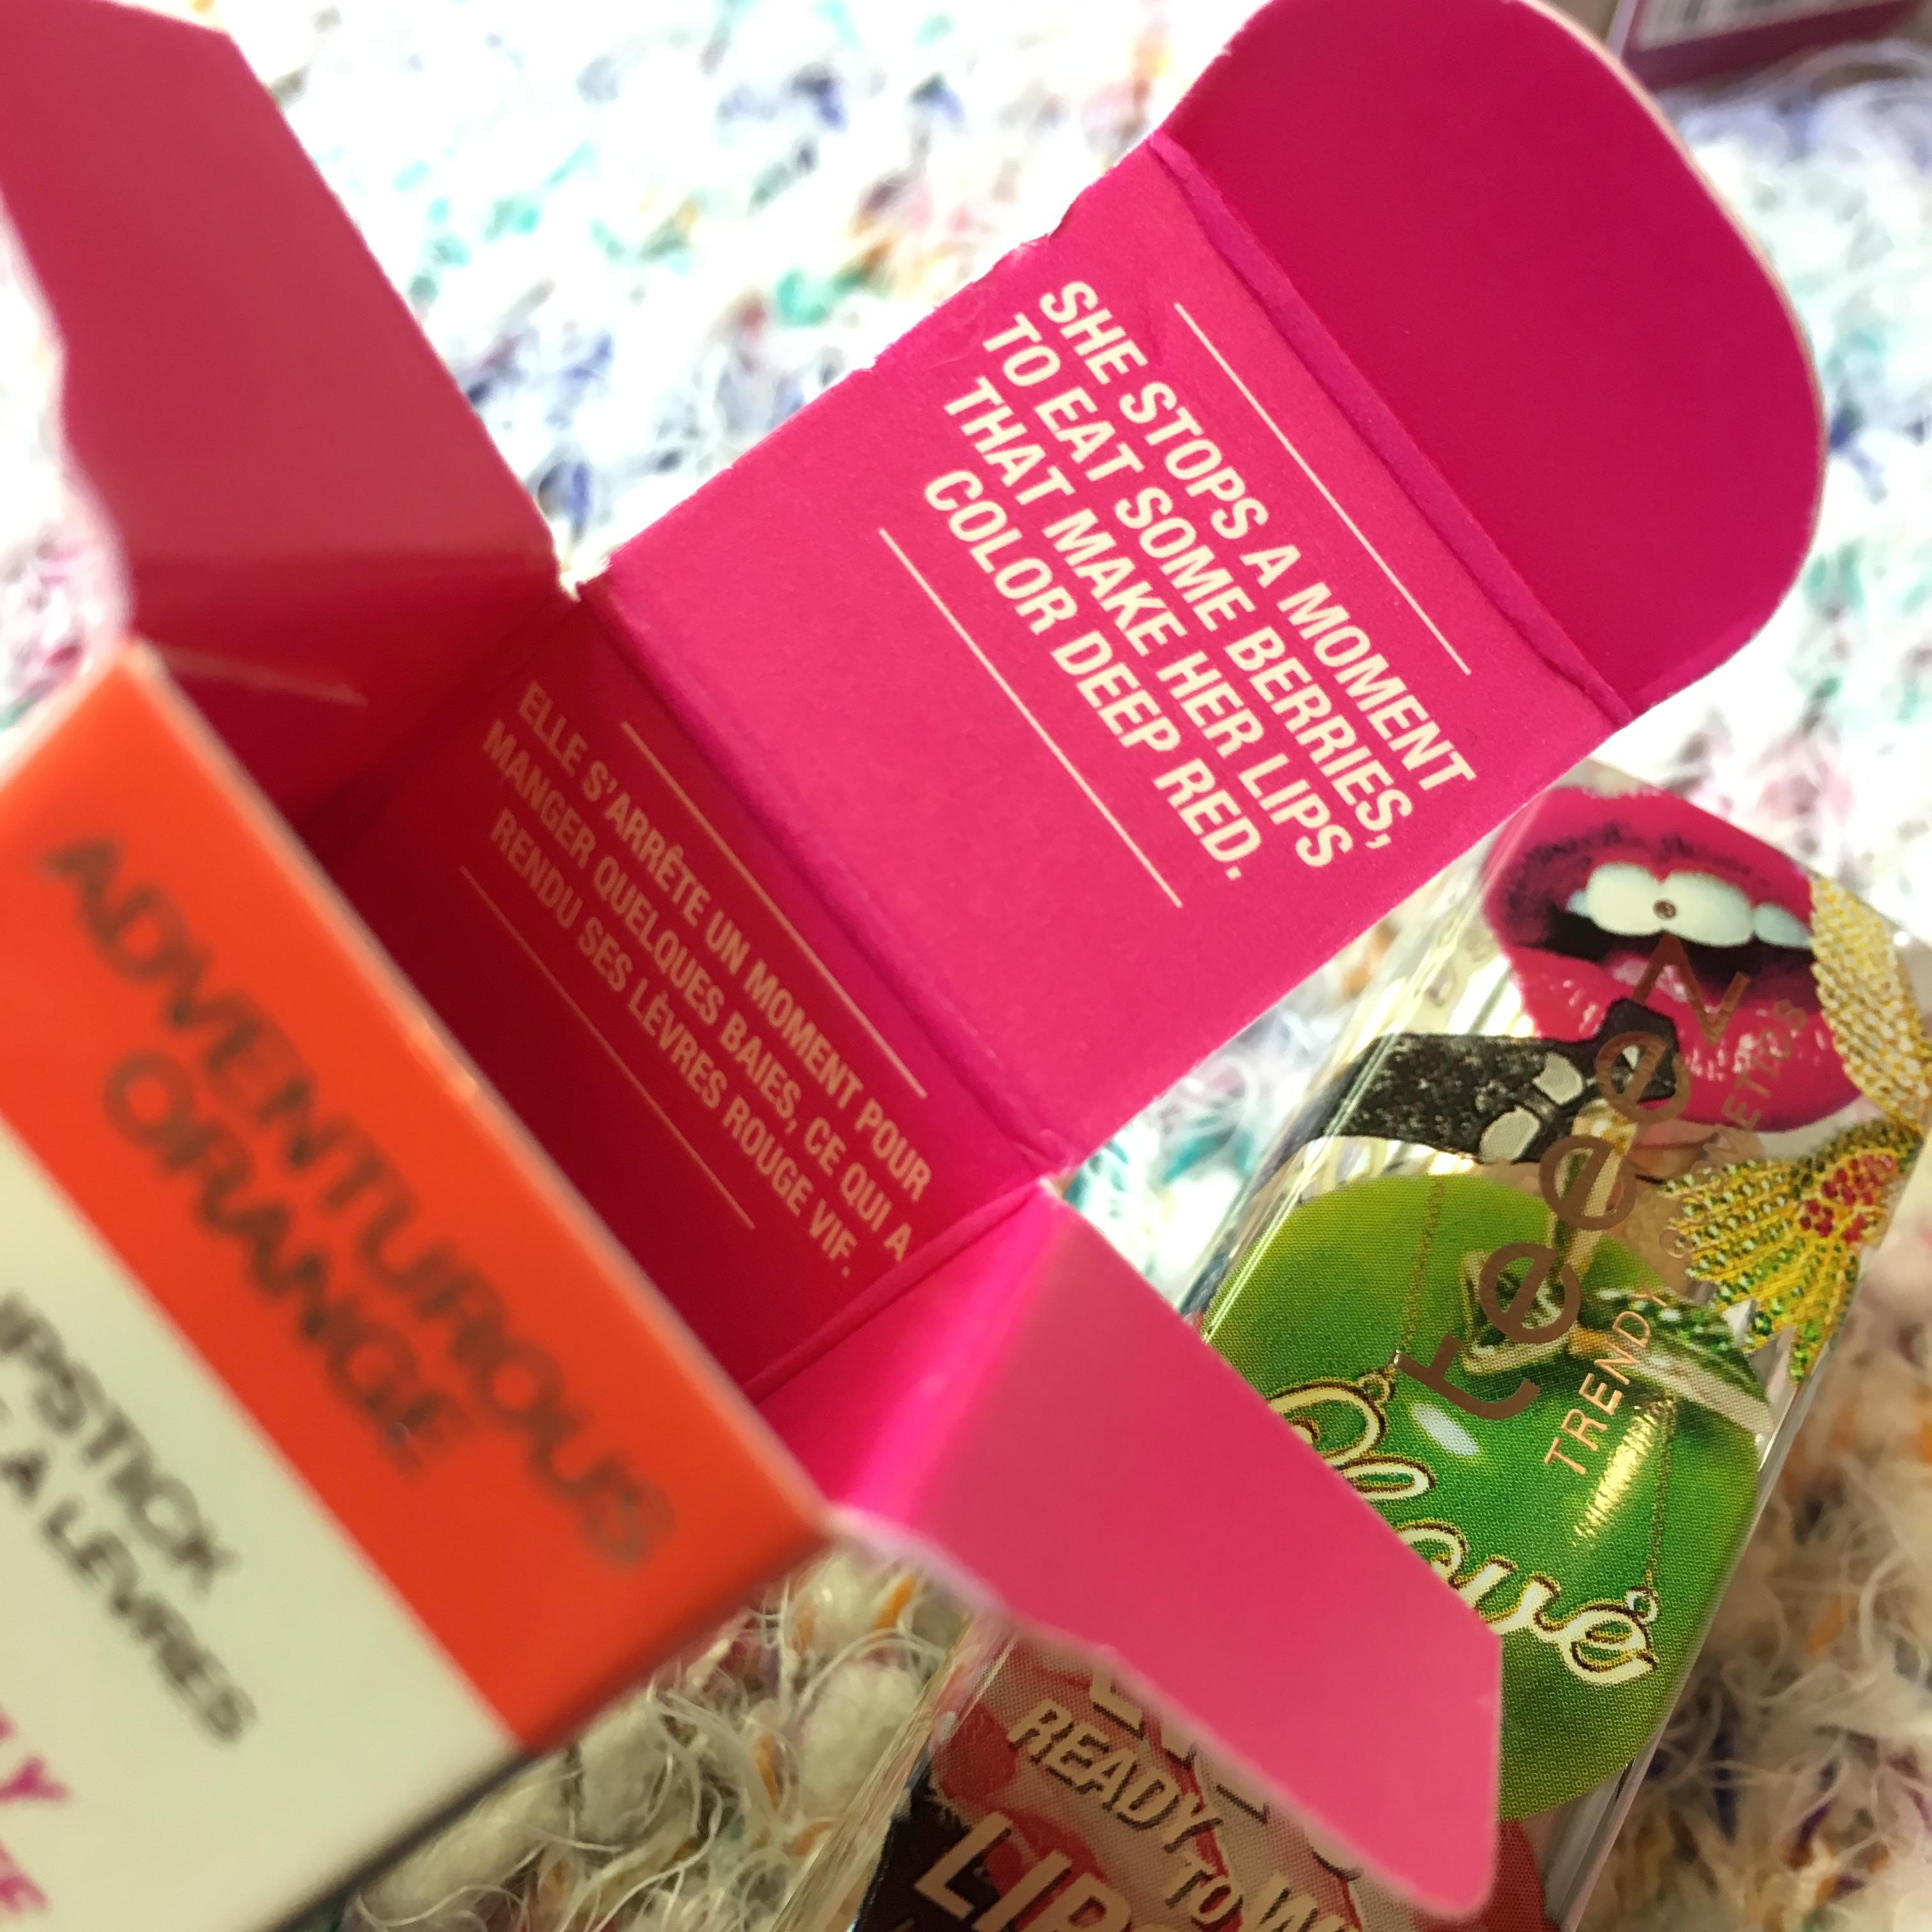 teeez cosmetics lipstick pick'n'dazzle